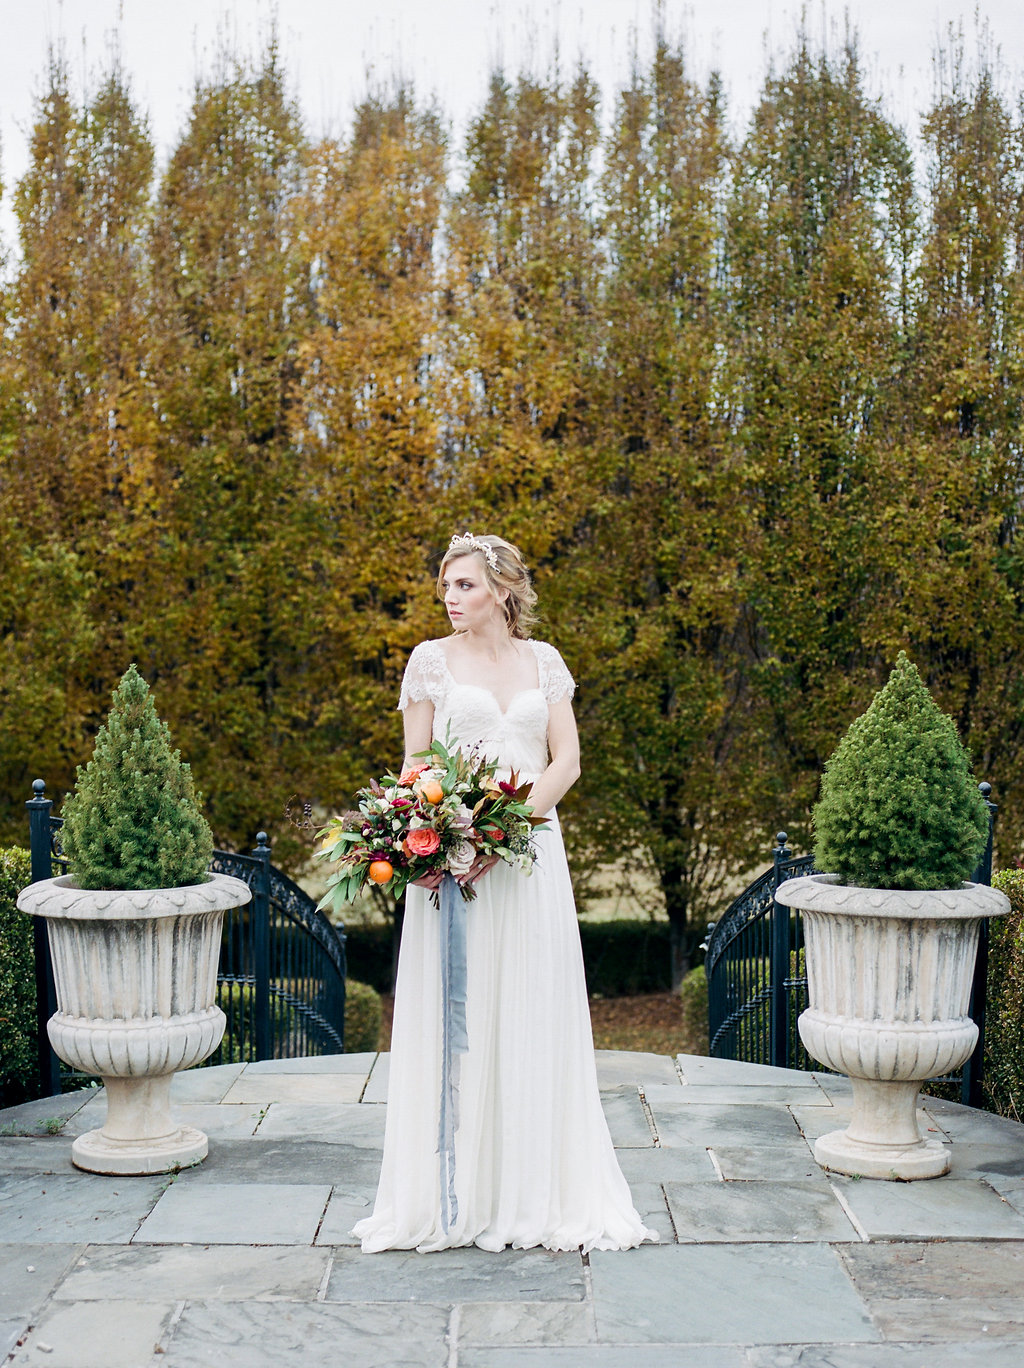 bridal fashion - photo by Lissa Ryan Photography https://ruffledblog.com/modern-romantic-wedding-ideas-with-family-heirlooms